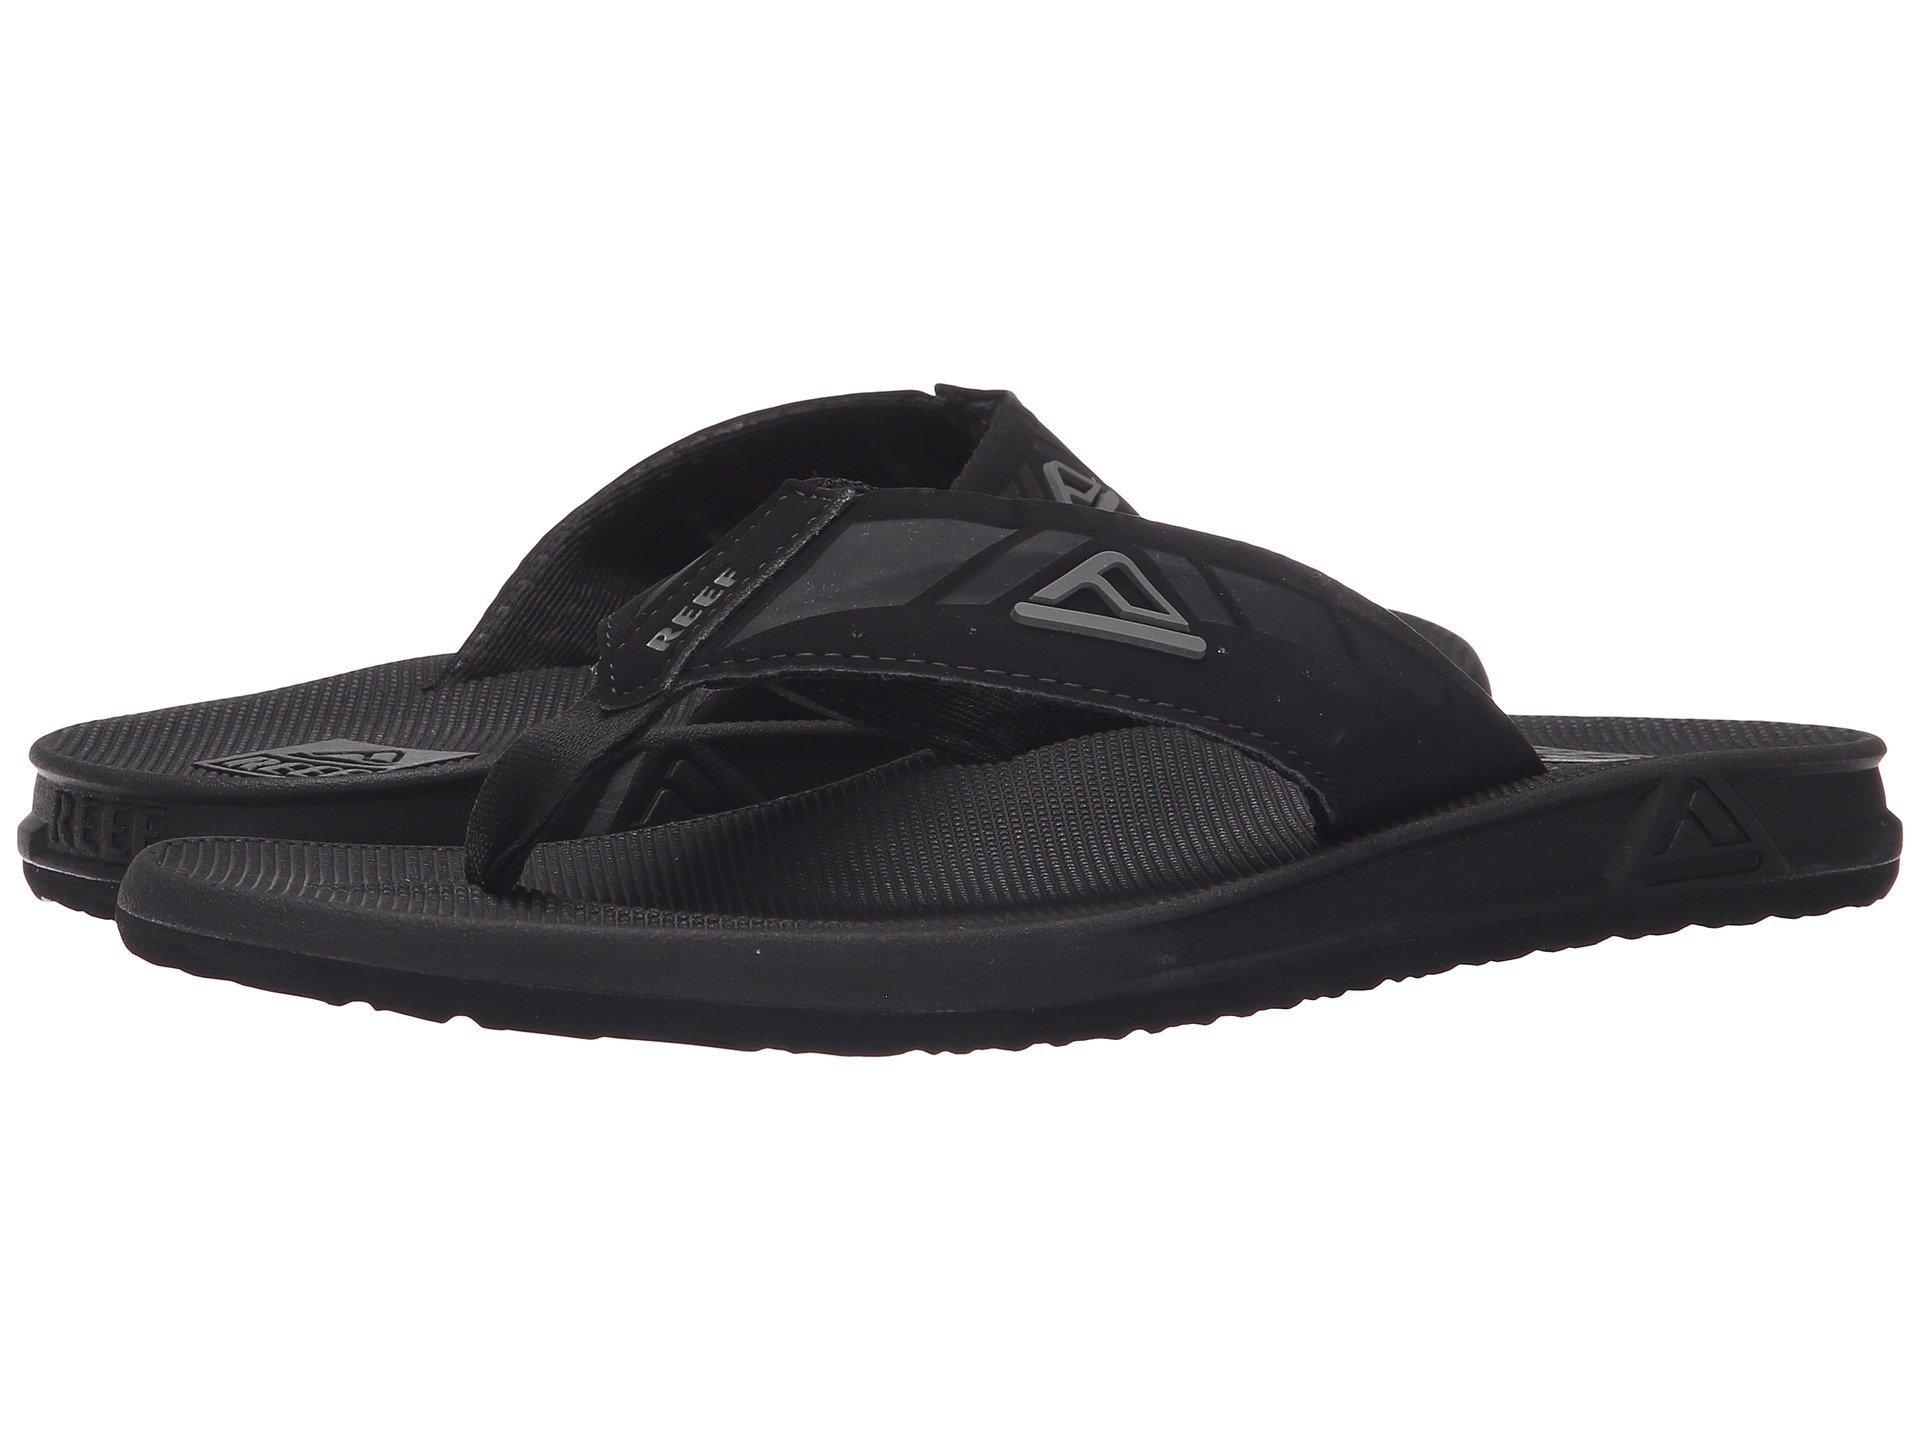 Reef Mens Phantom Sandals Black/Black Size 13